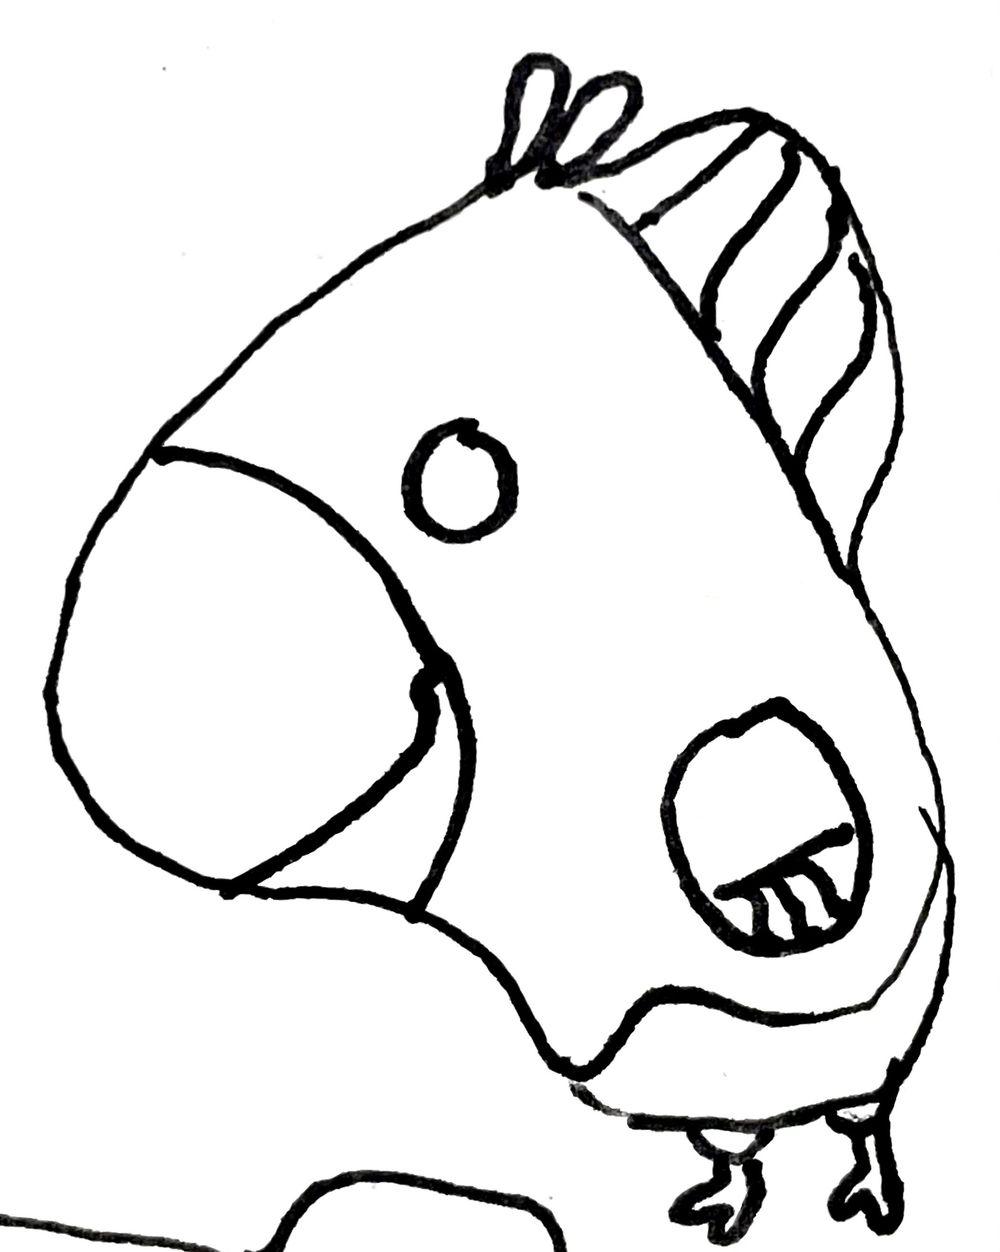 Fun animals - image 3 - student project